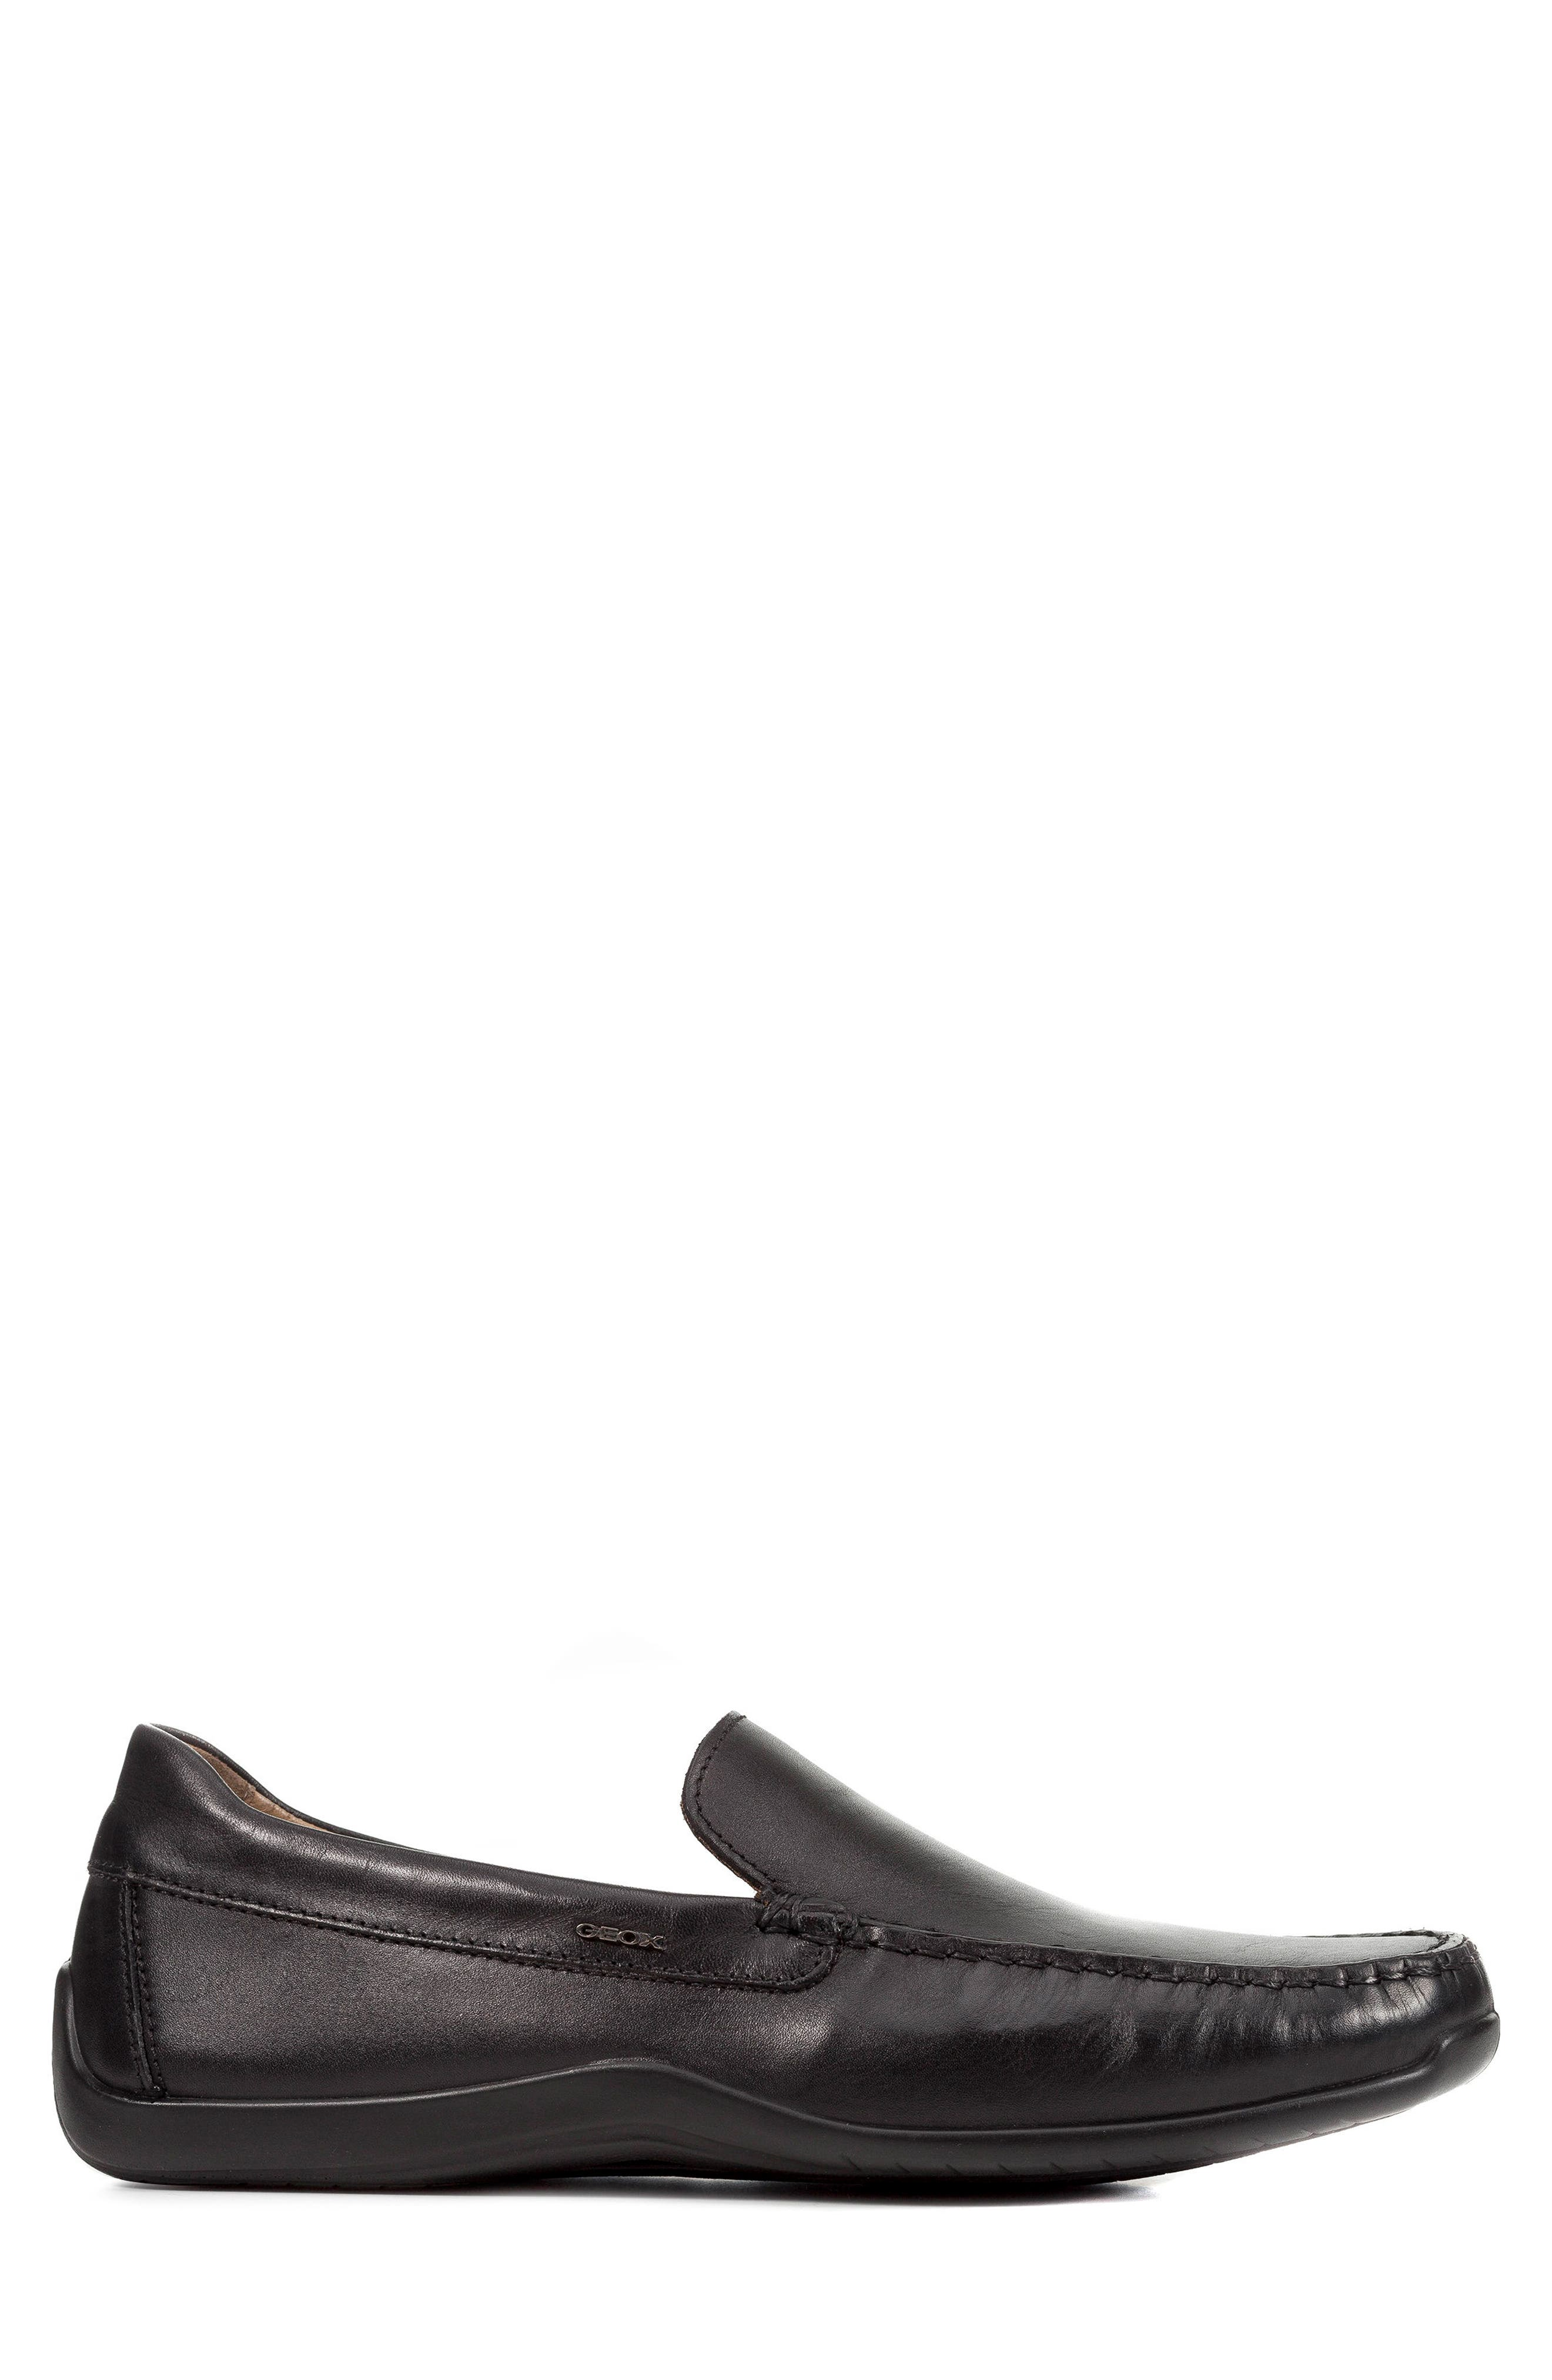 'U Xense Mox' Driving Shoe,                             Alternate thumbnail 3, color,                             Black Leather